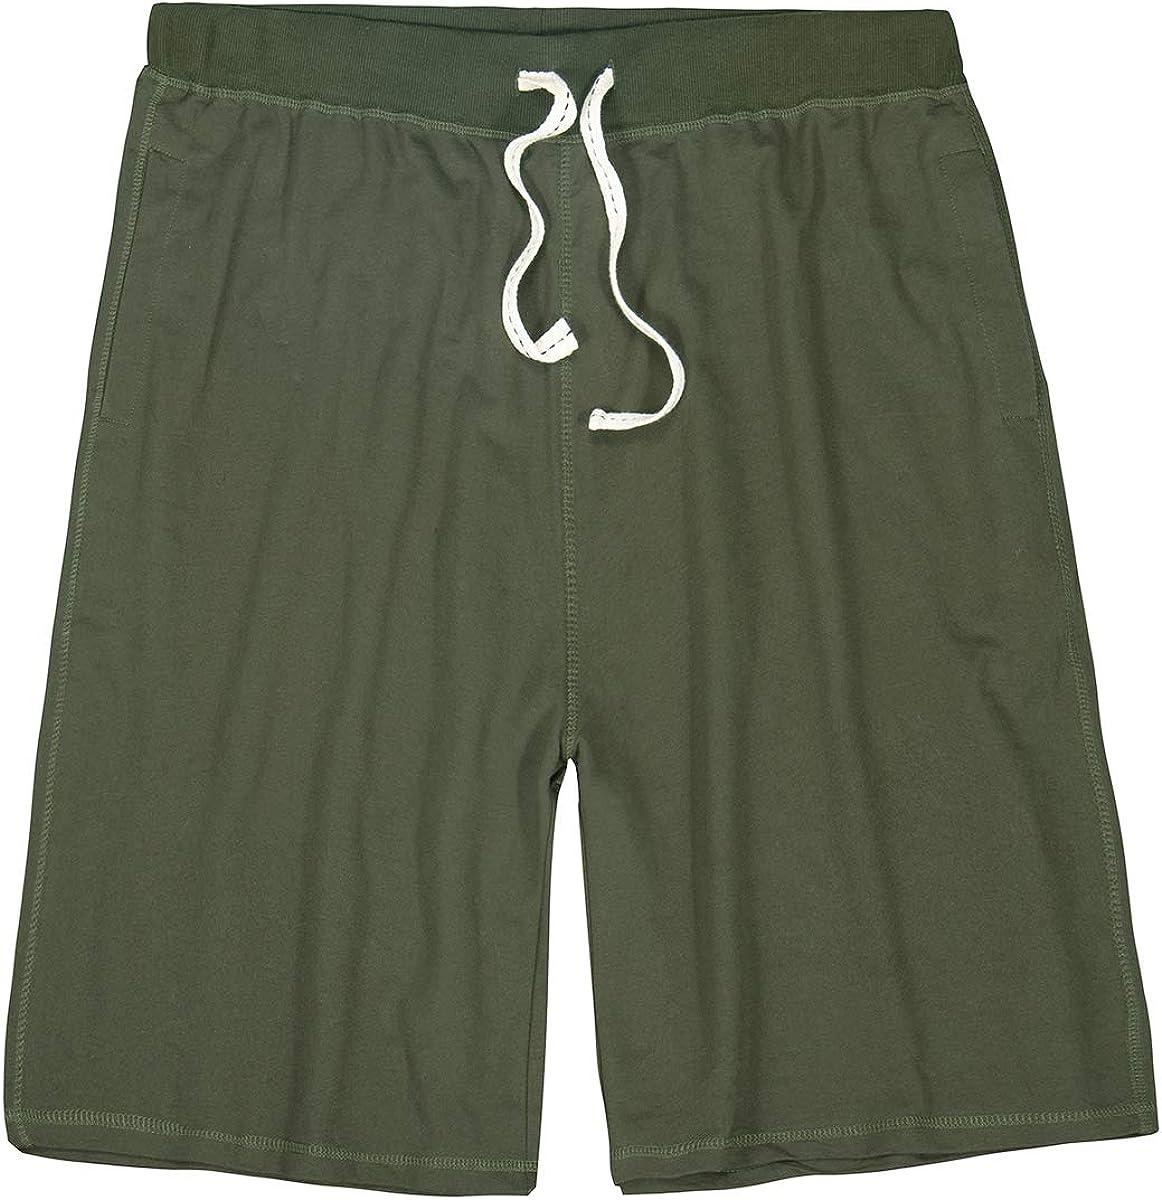 Kolongvangie Mens Casual Cotton Shorts Workout Drawstring Summer Beach Pajamas Shorts with Elastic Waist and Pockets